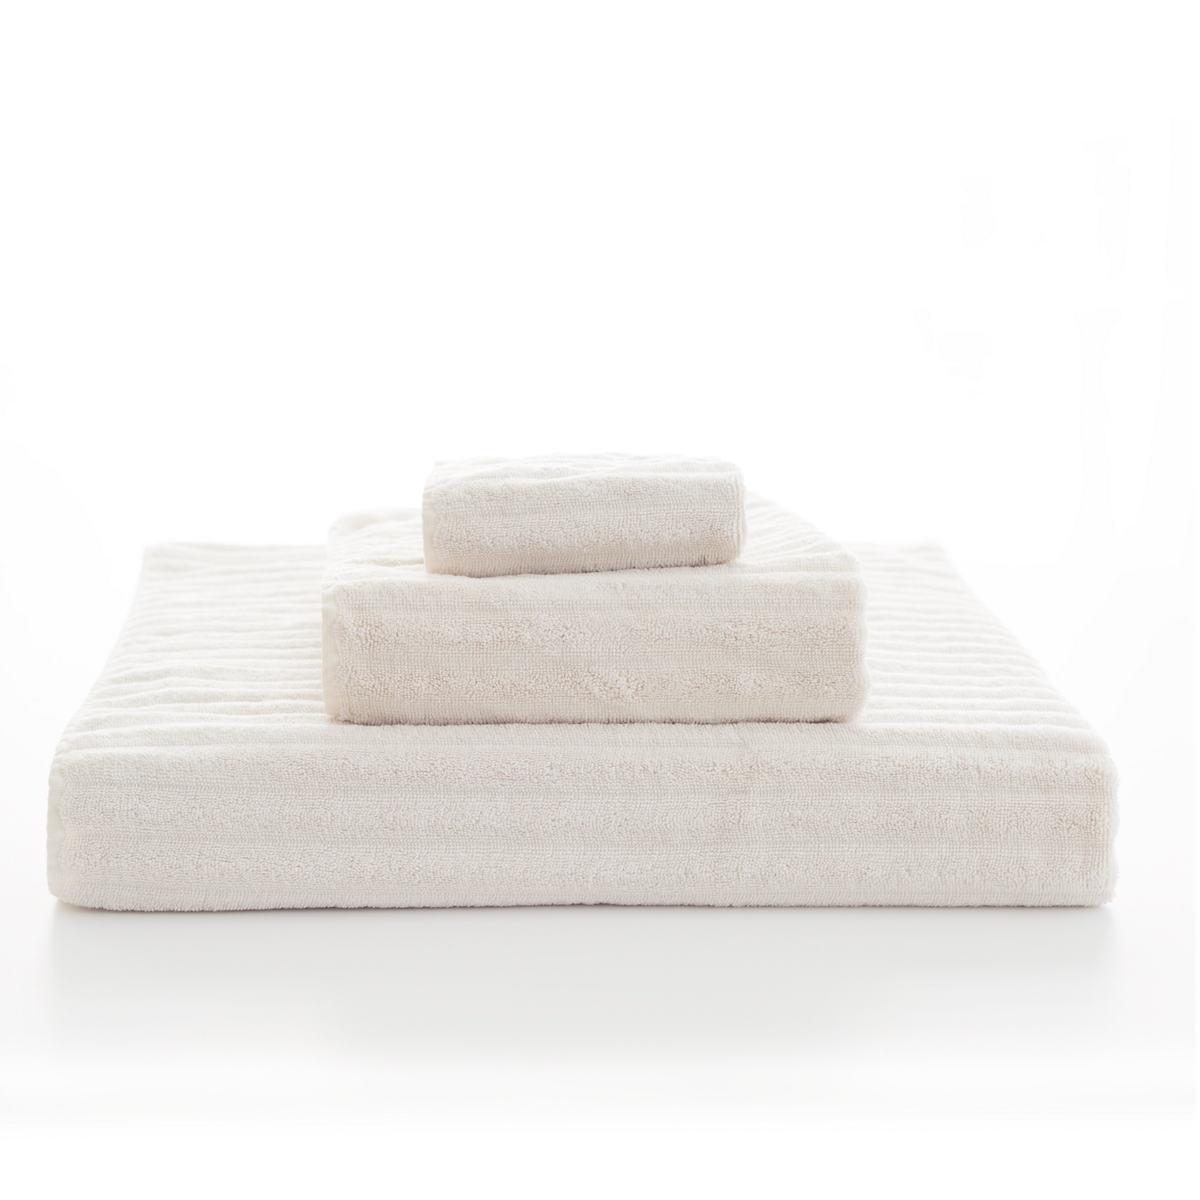 Boyfriend Ivory Towel